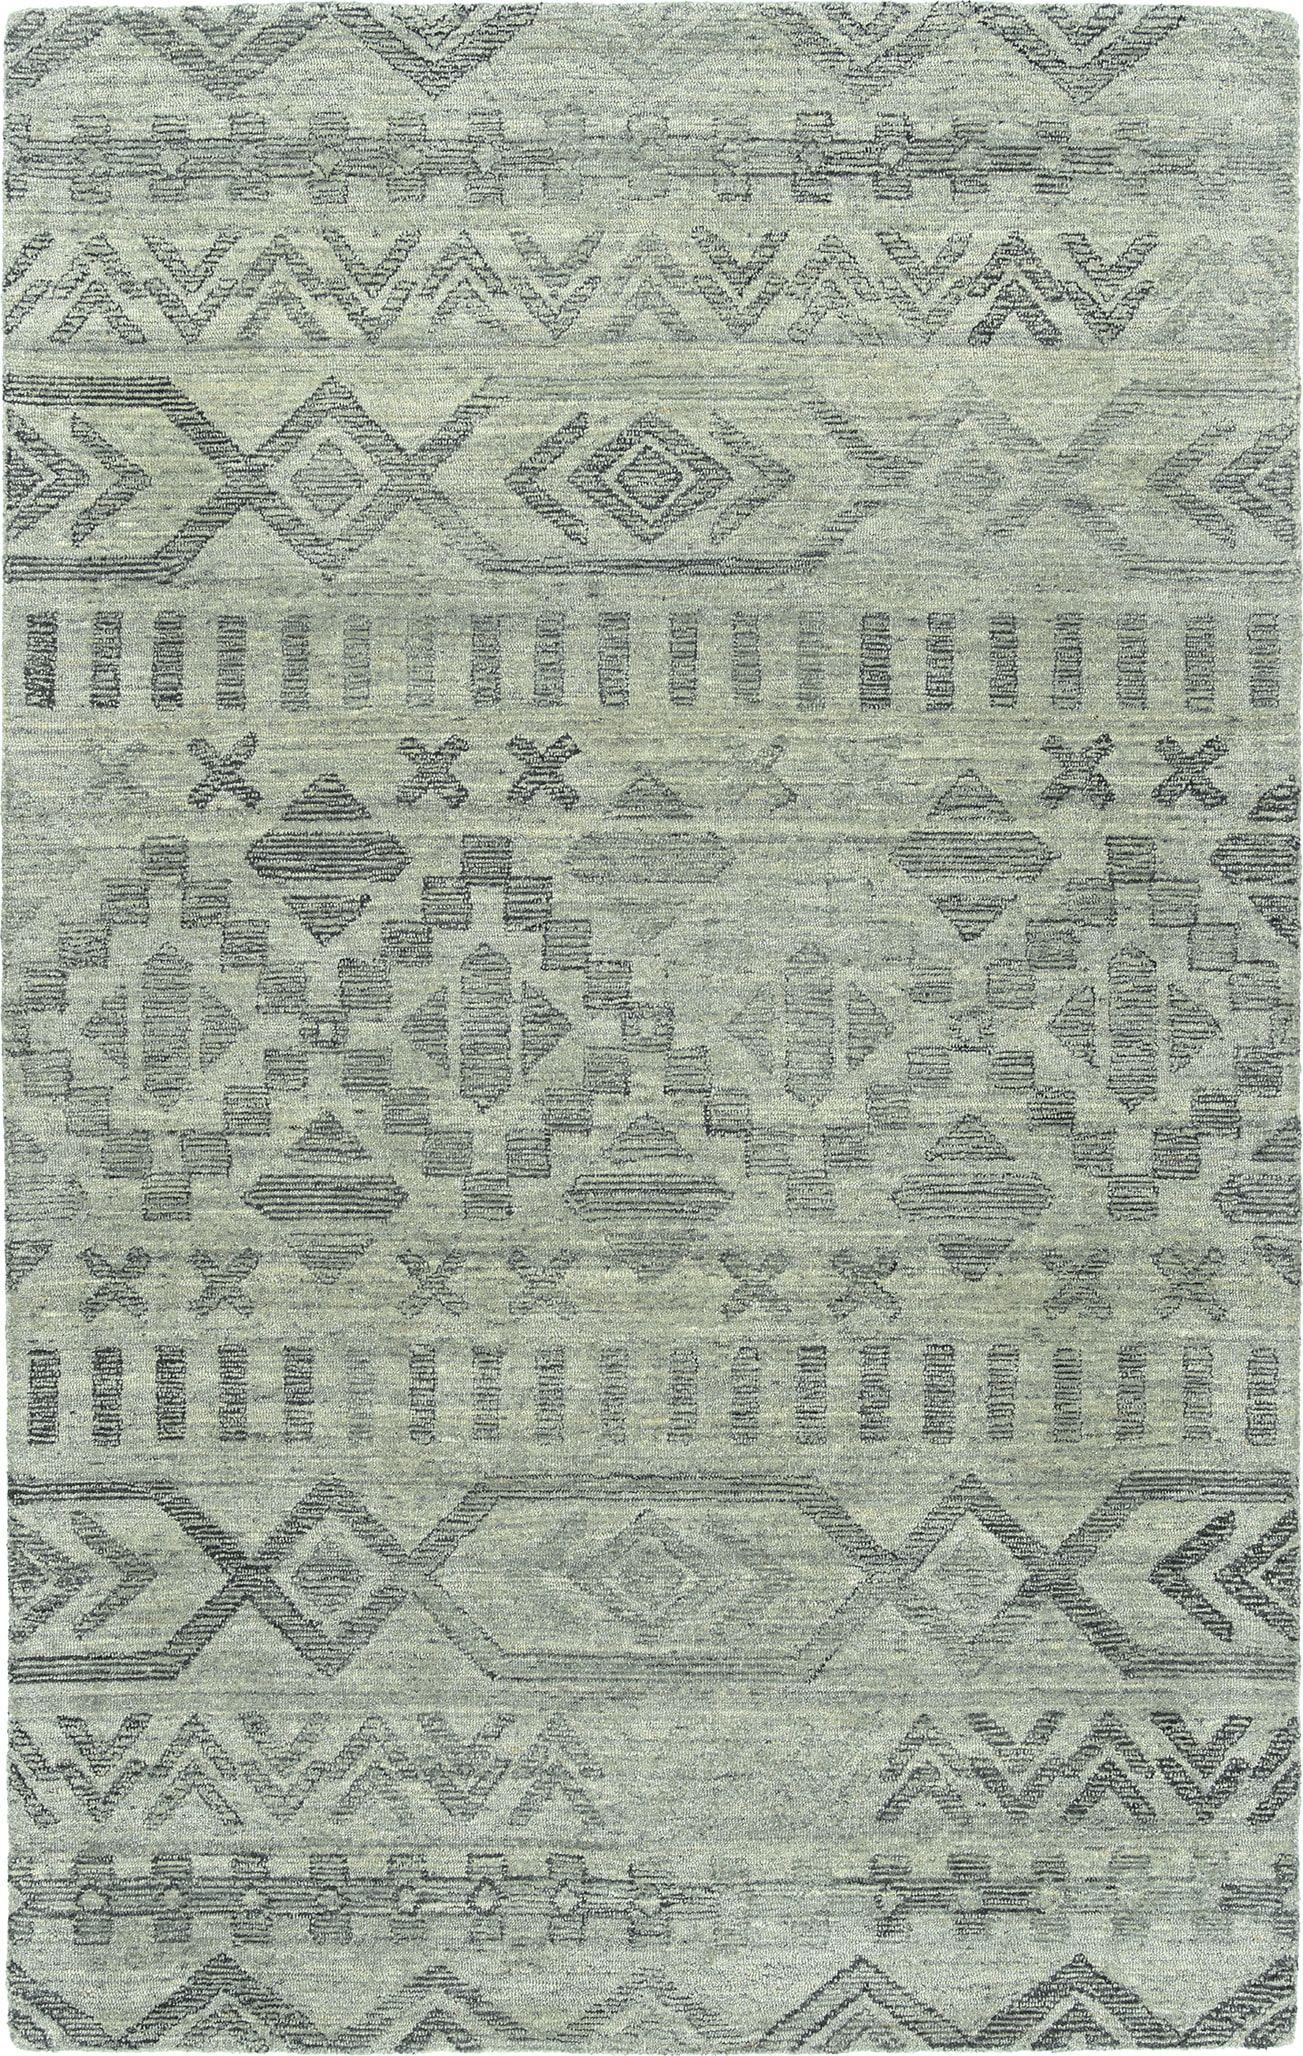 Gray Tribal Print Rug Hand Tufted Of